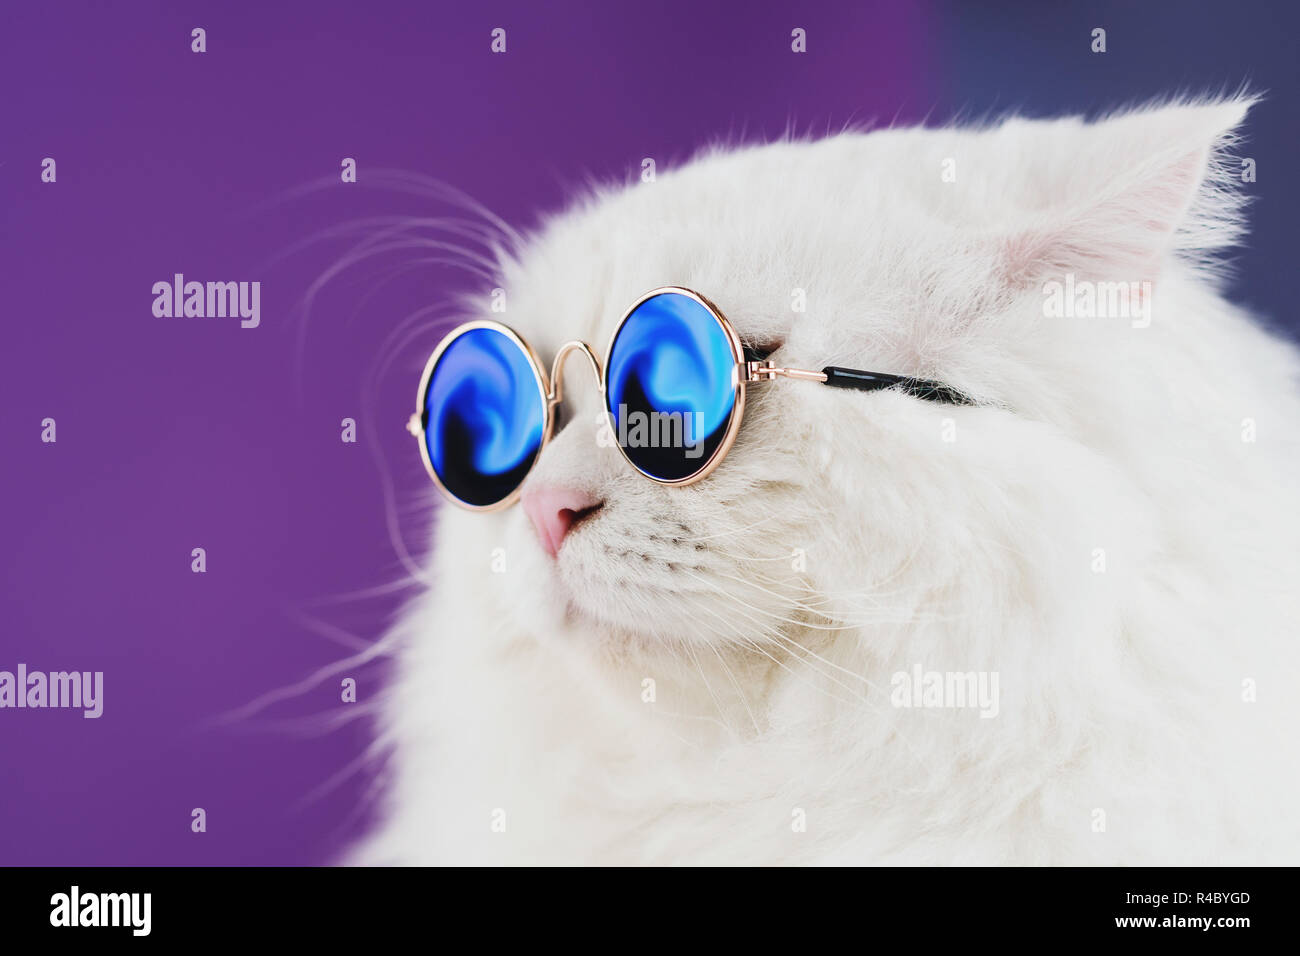 179351bbd Close portrait of white furry cat in fashion sunglasses. Studio photo.  Luxurious domestic kitty